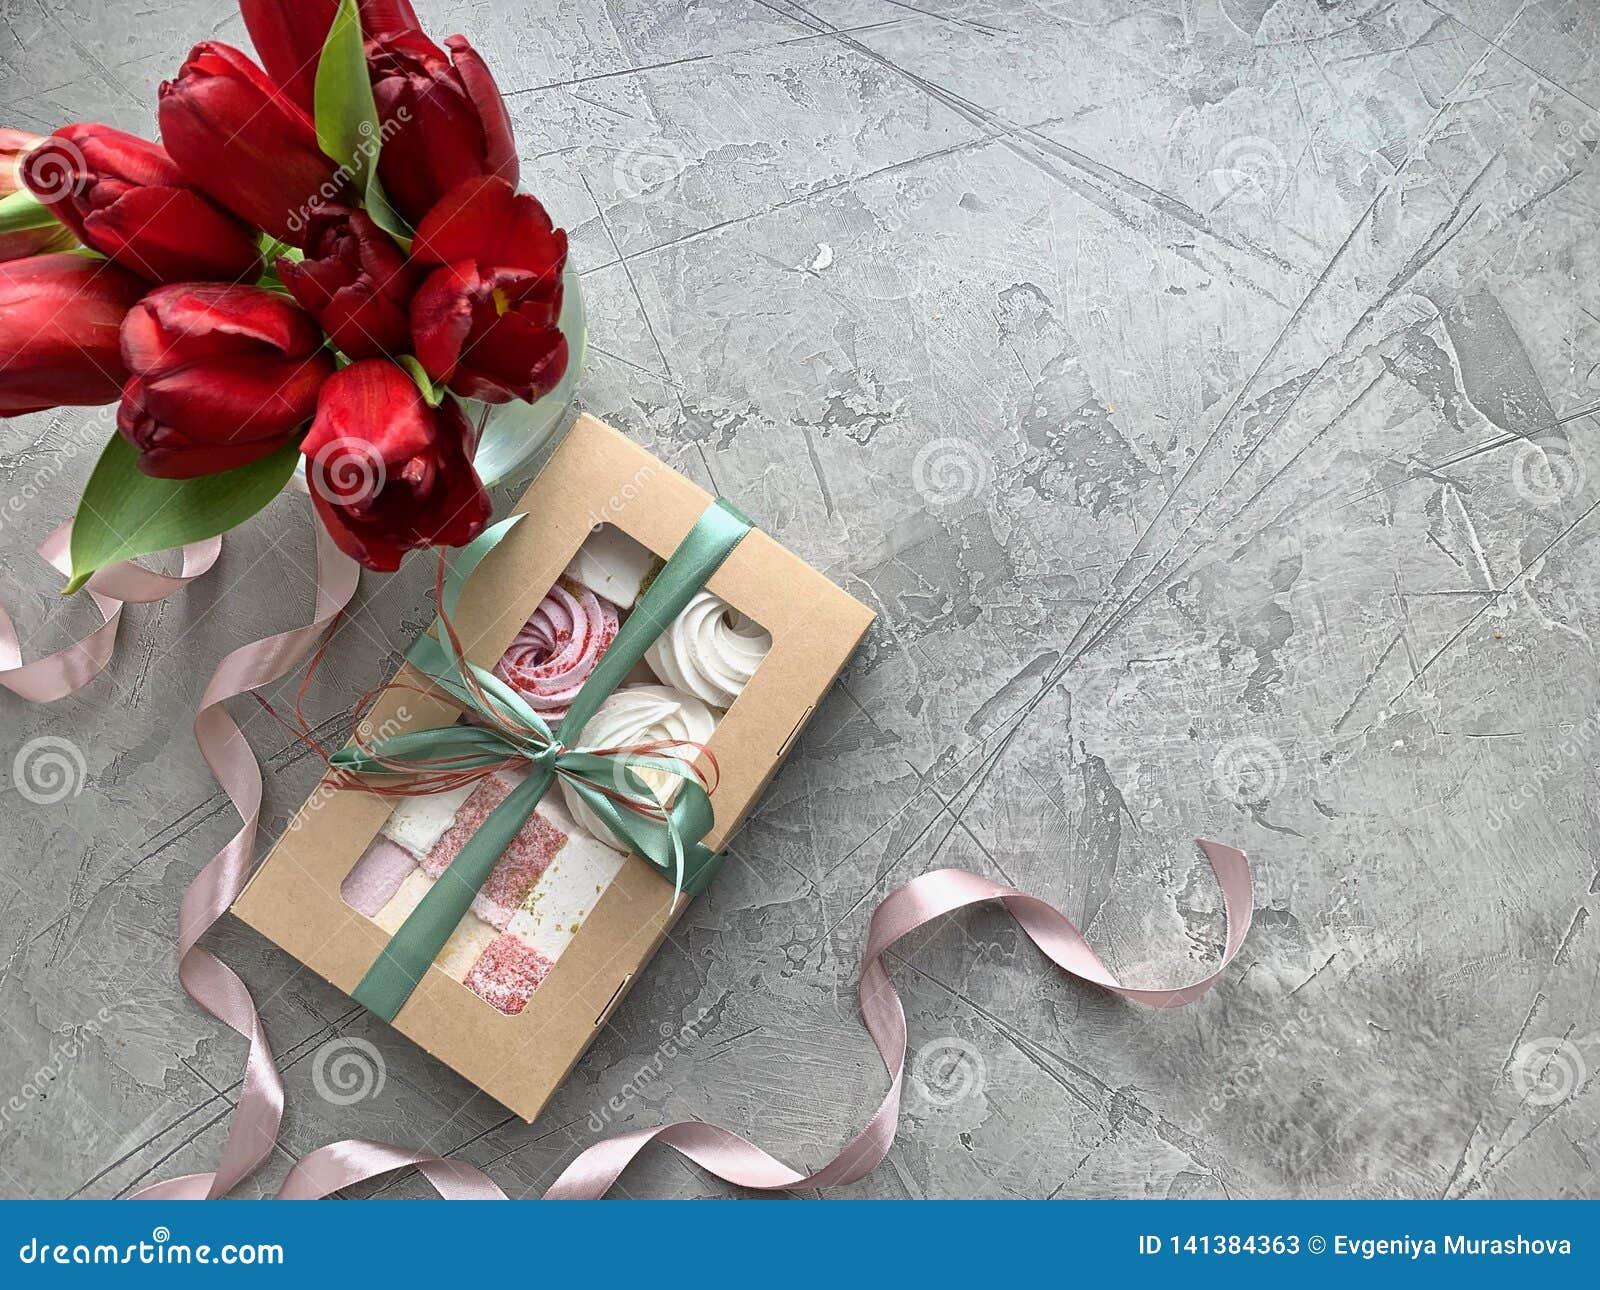 Sweet box with marshmallow, handmade gift.Flat lay food